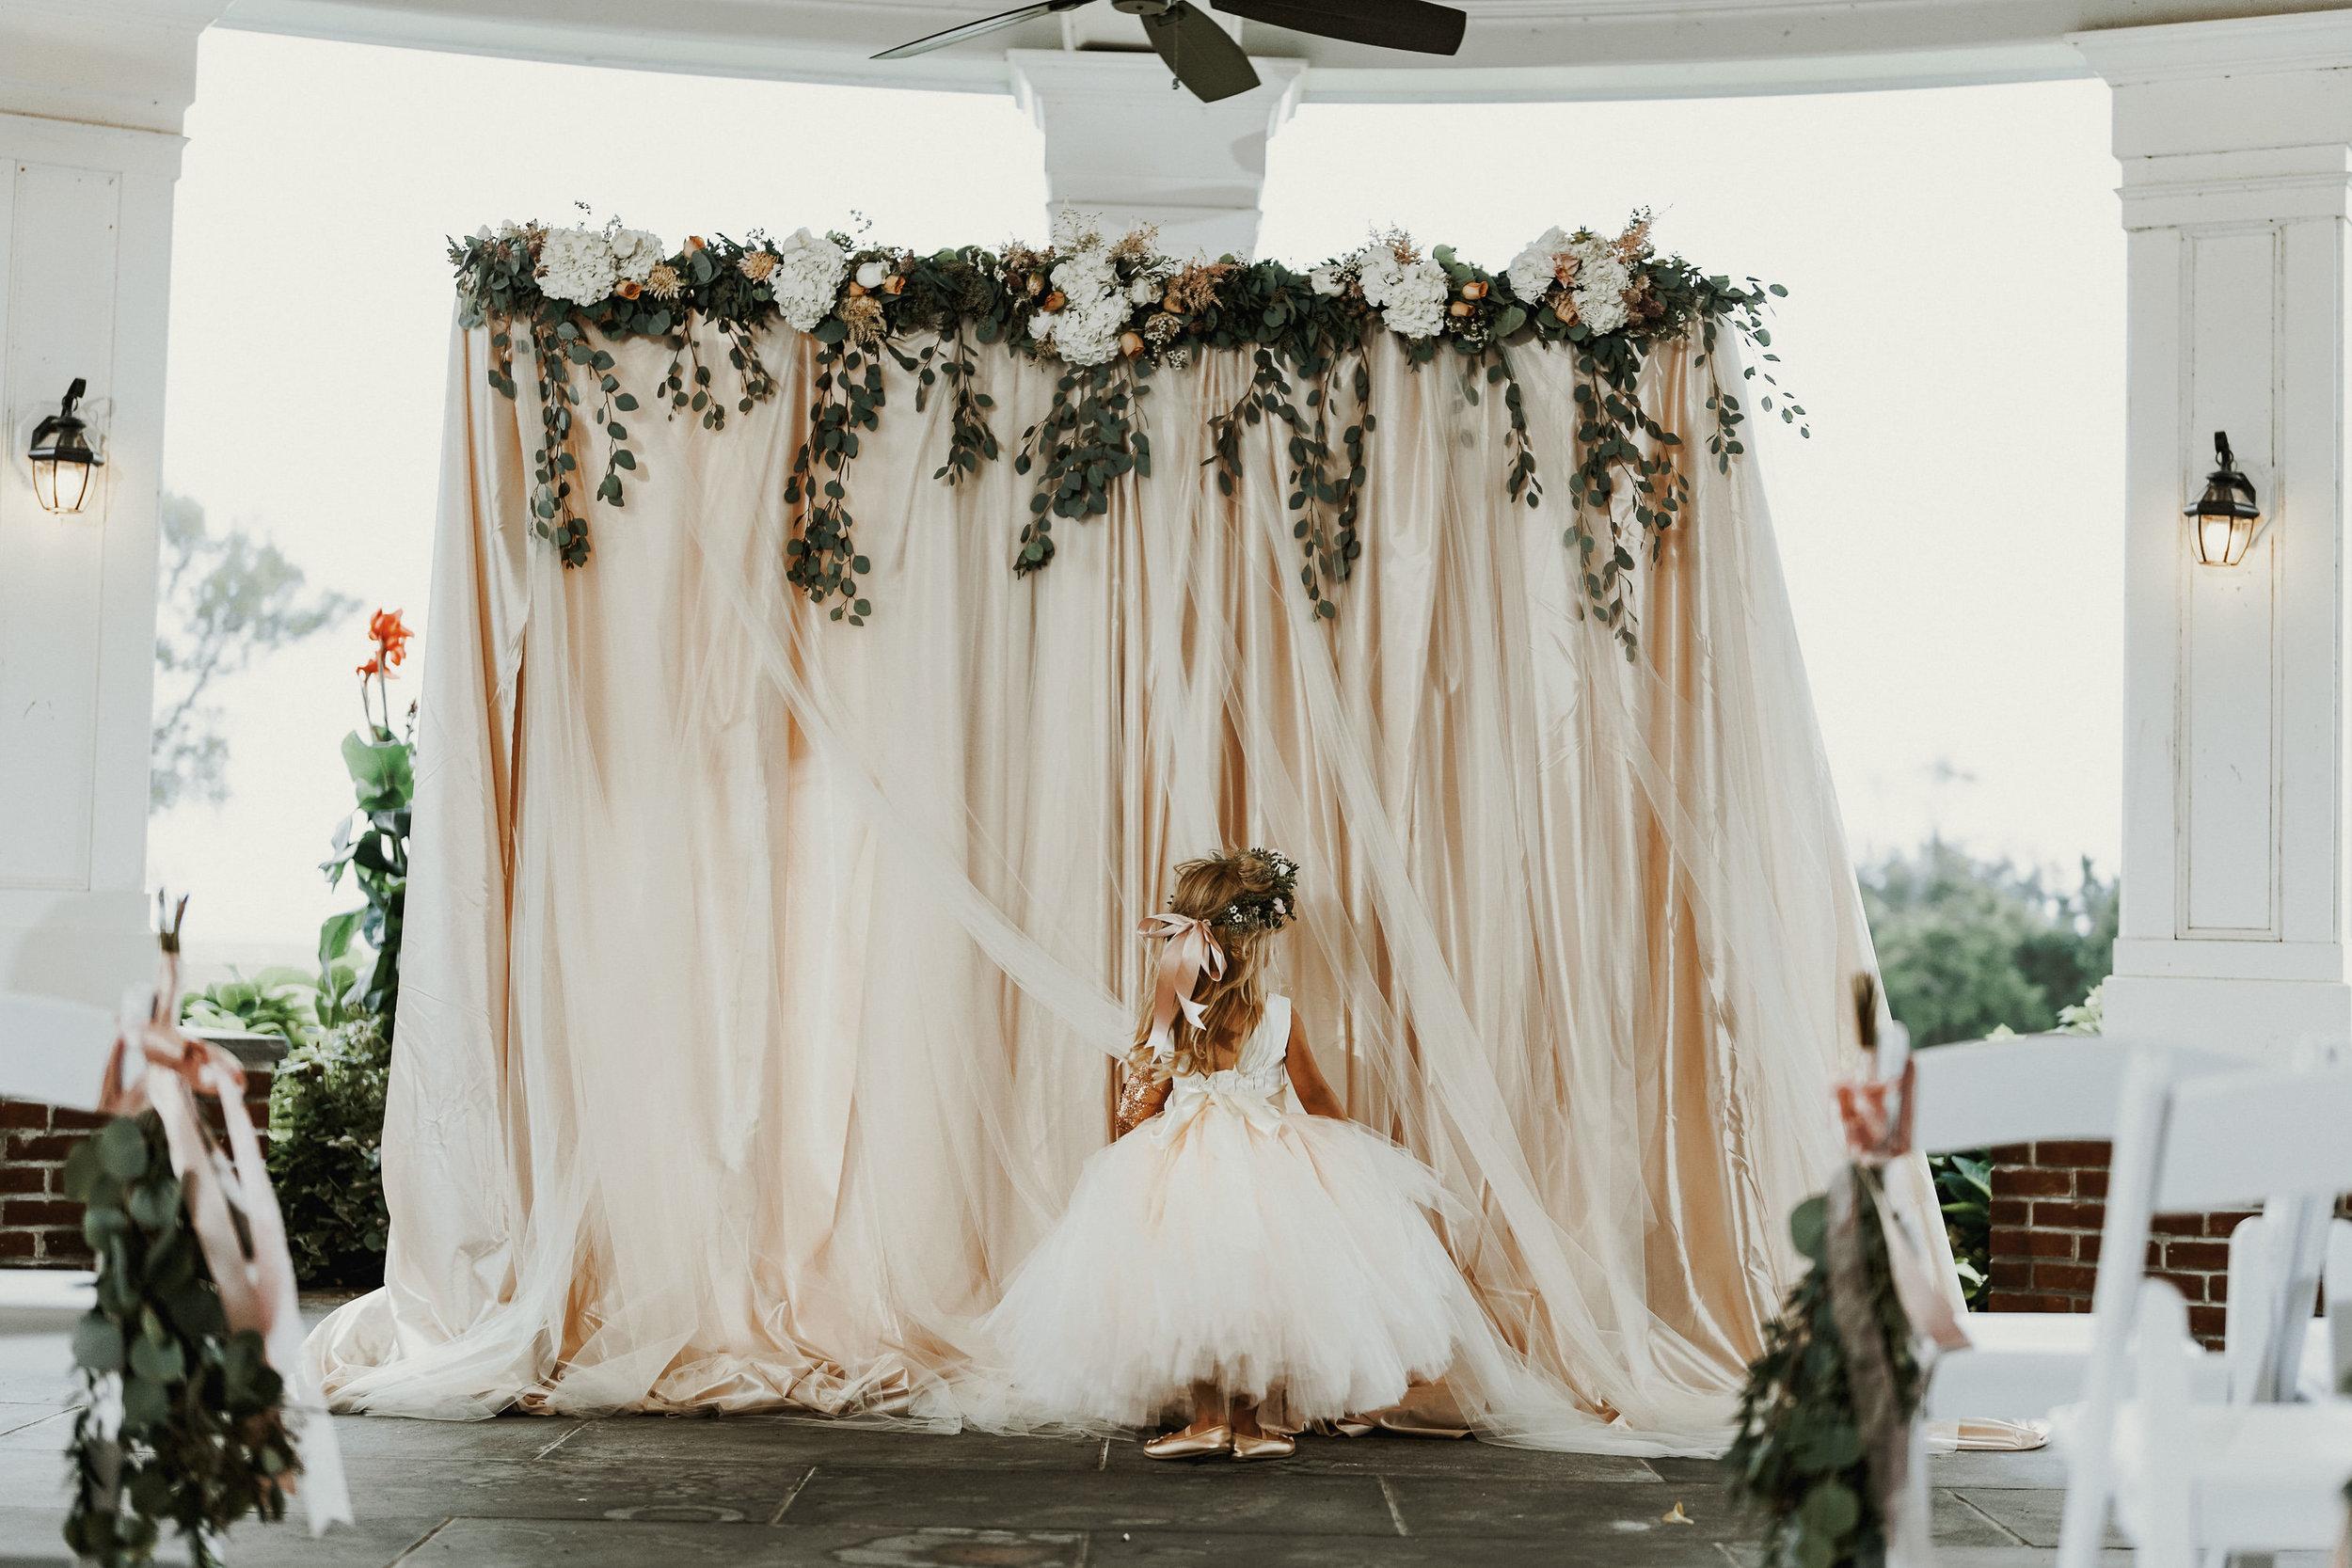 Our Wedding Photos | Pine Barren Beauty | wedding photo ideas, wedding ceremony ideas, wedding backdrop ideas, blush tulle wedding backdrop with eucalyptus